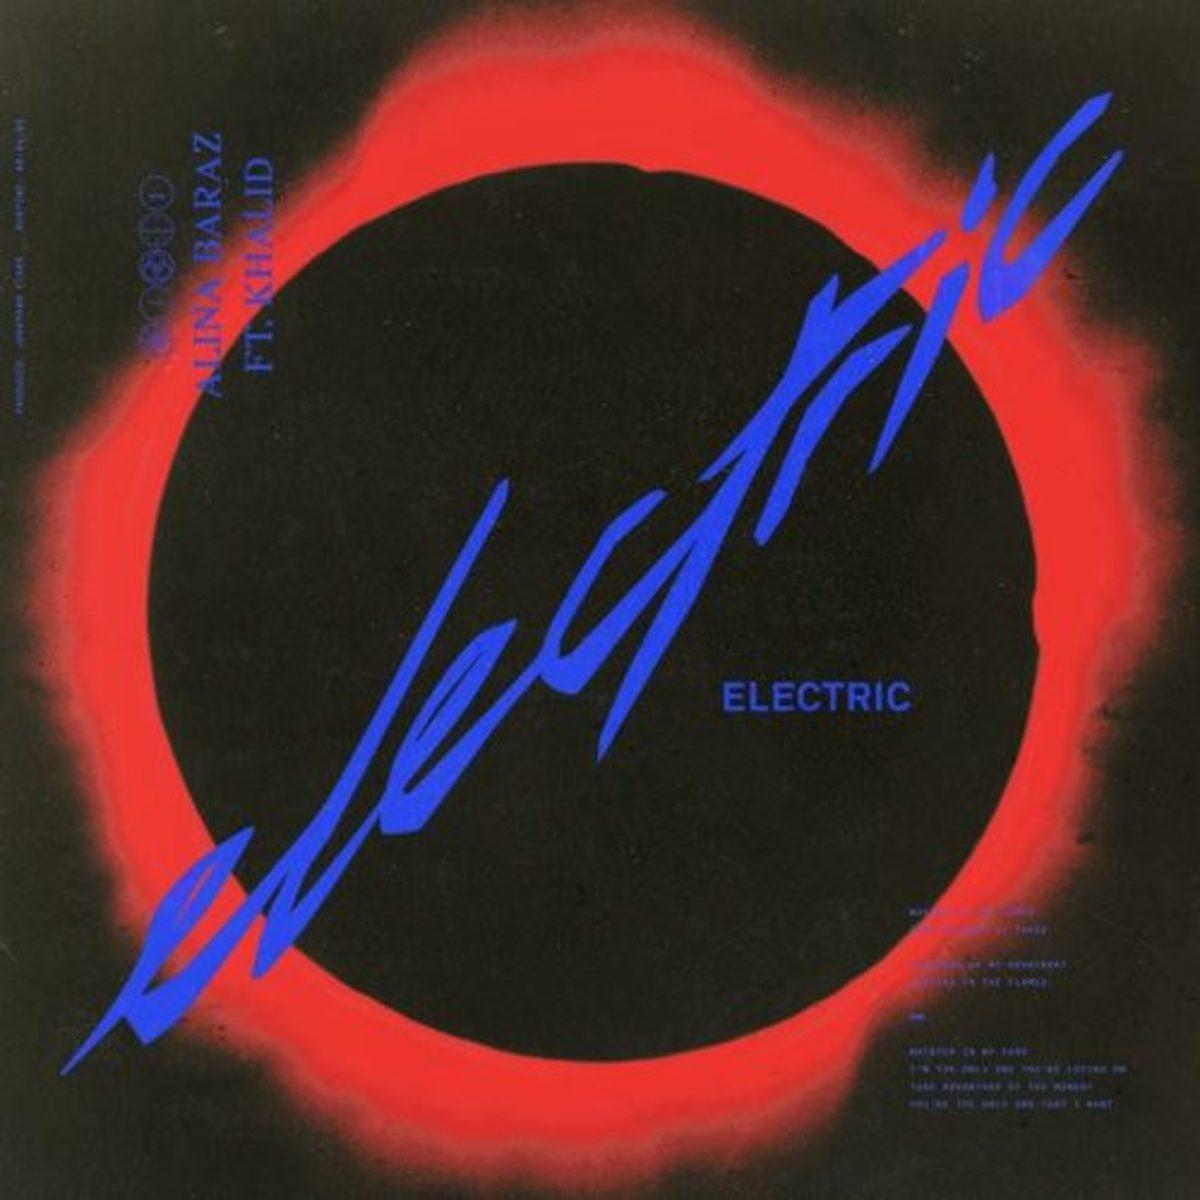 alina-baraz-electric.jpg